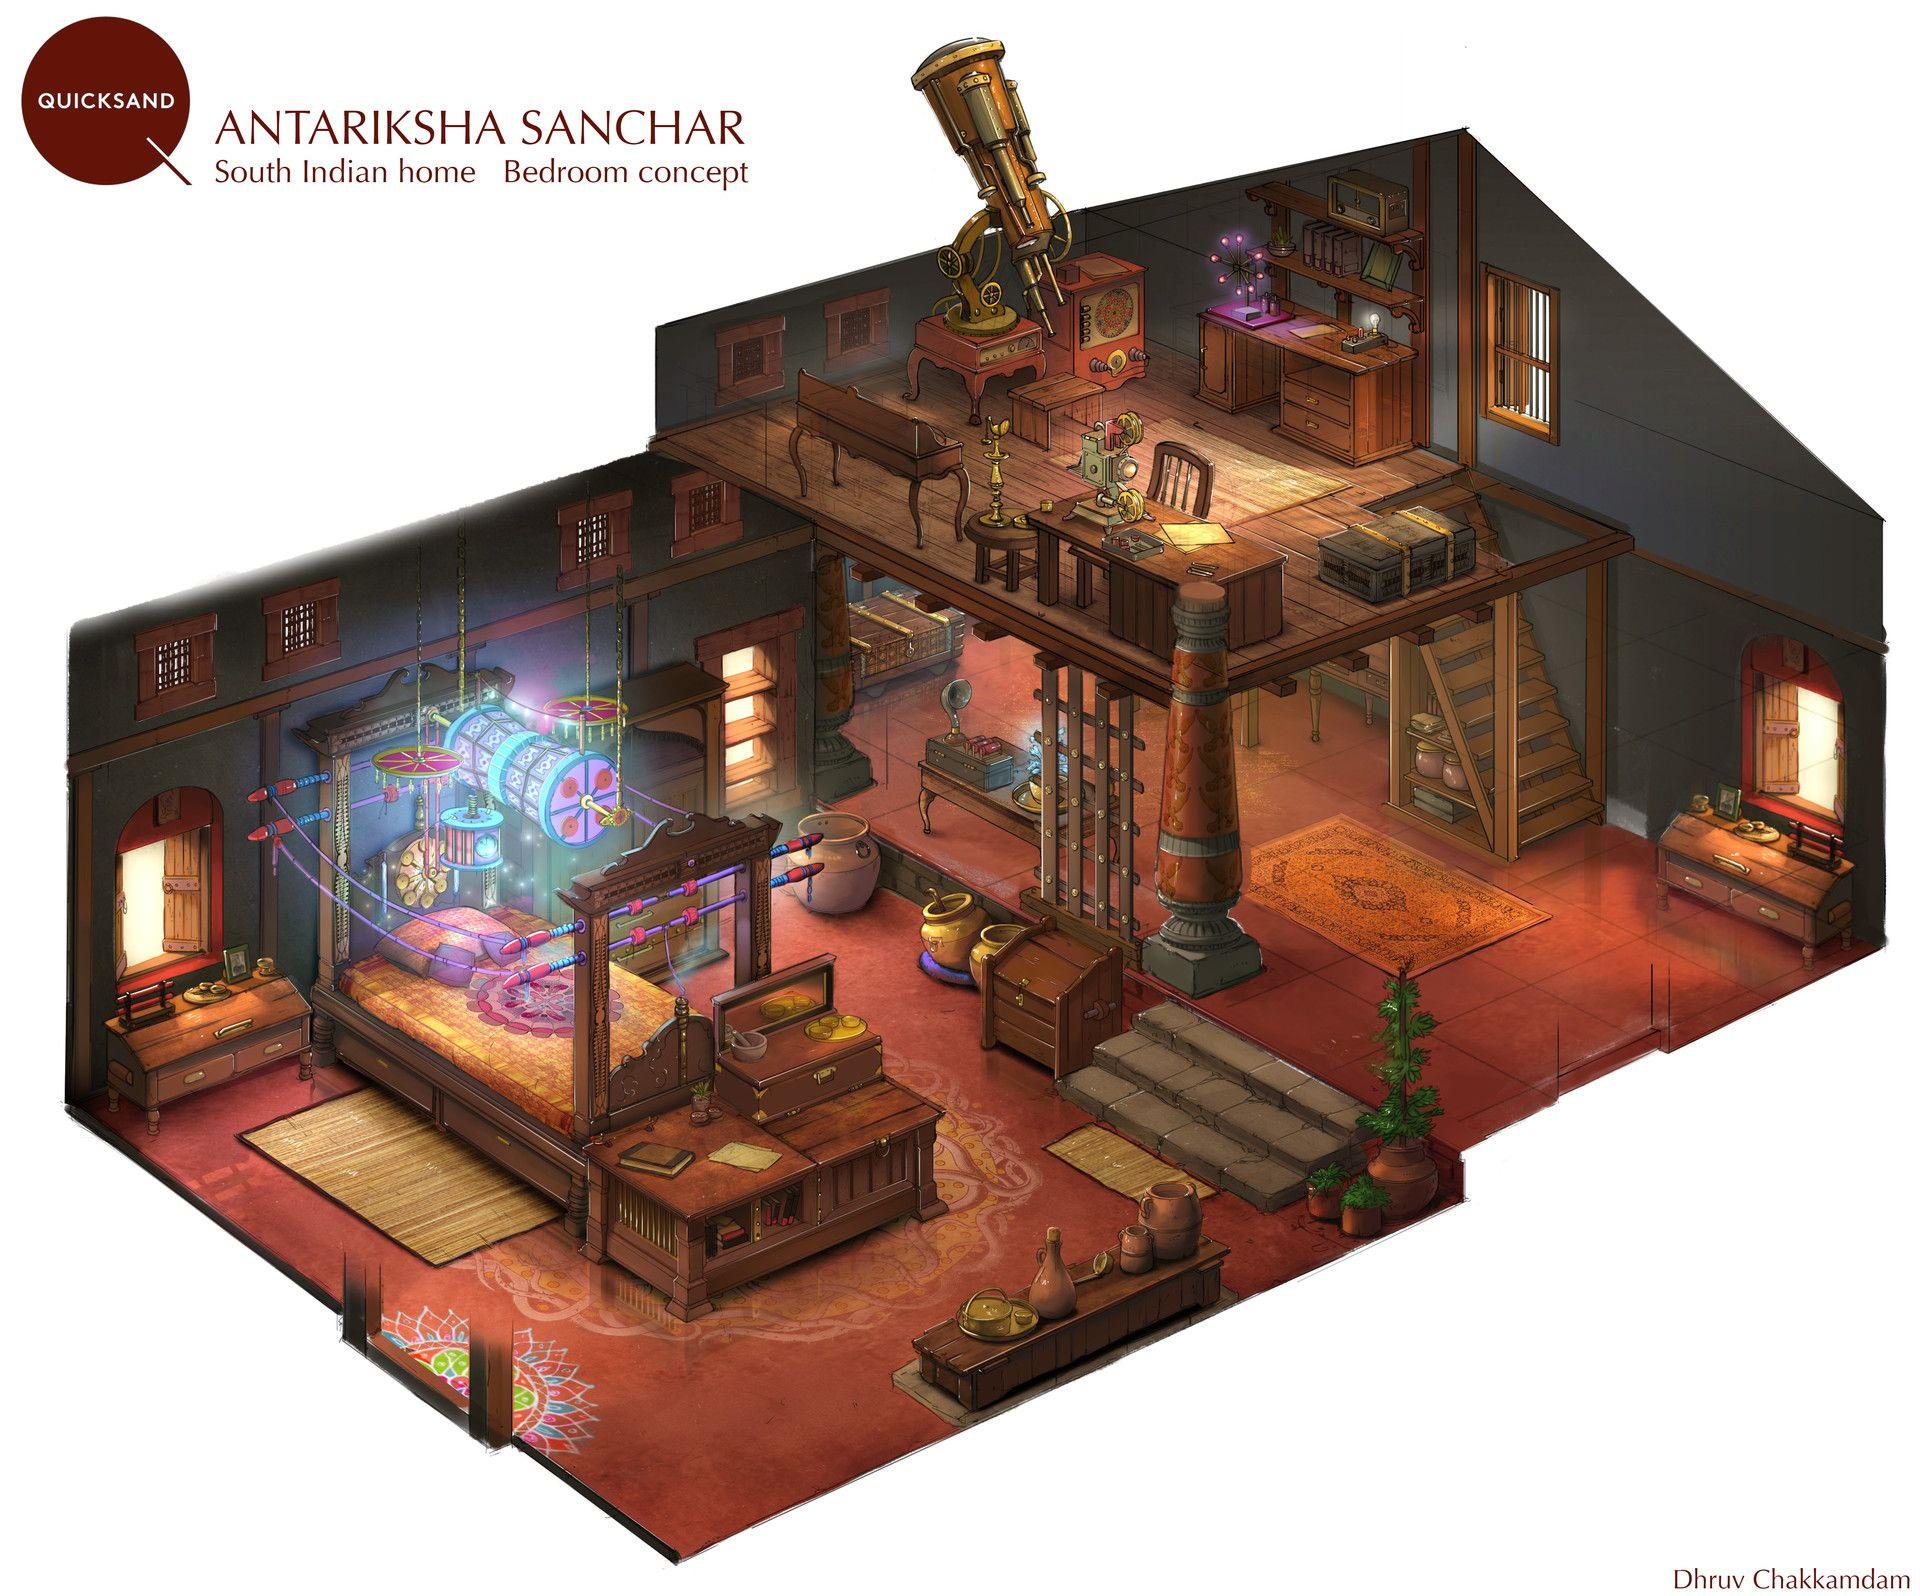 artstation south indian home concept dhruv chakkamadam environments interior pinterest. Black Bedroom Furniture Sets. Home Design Ideas